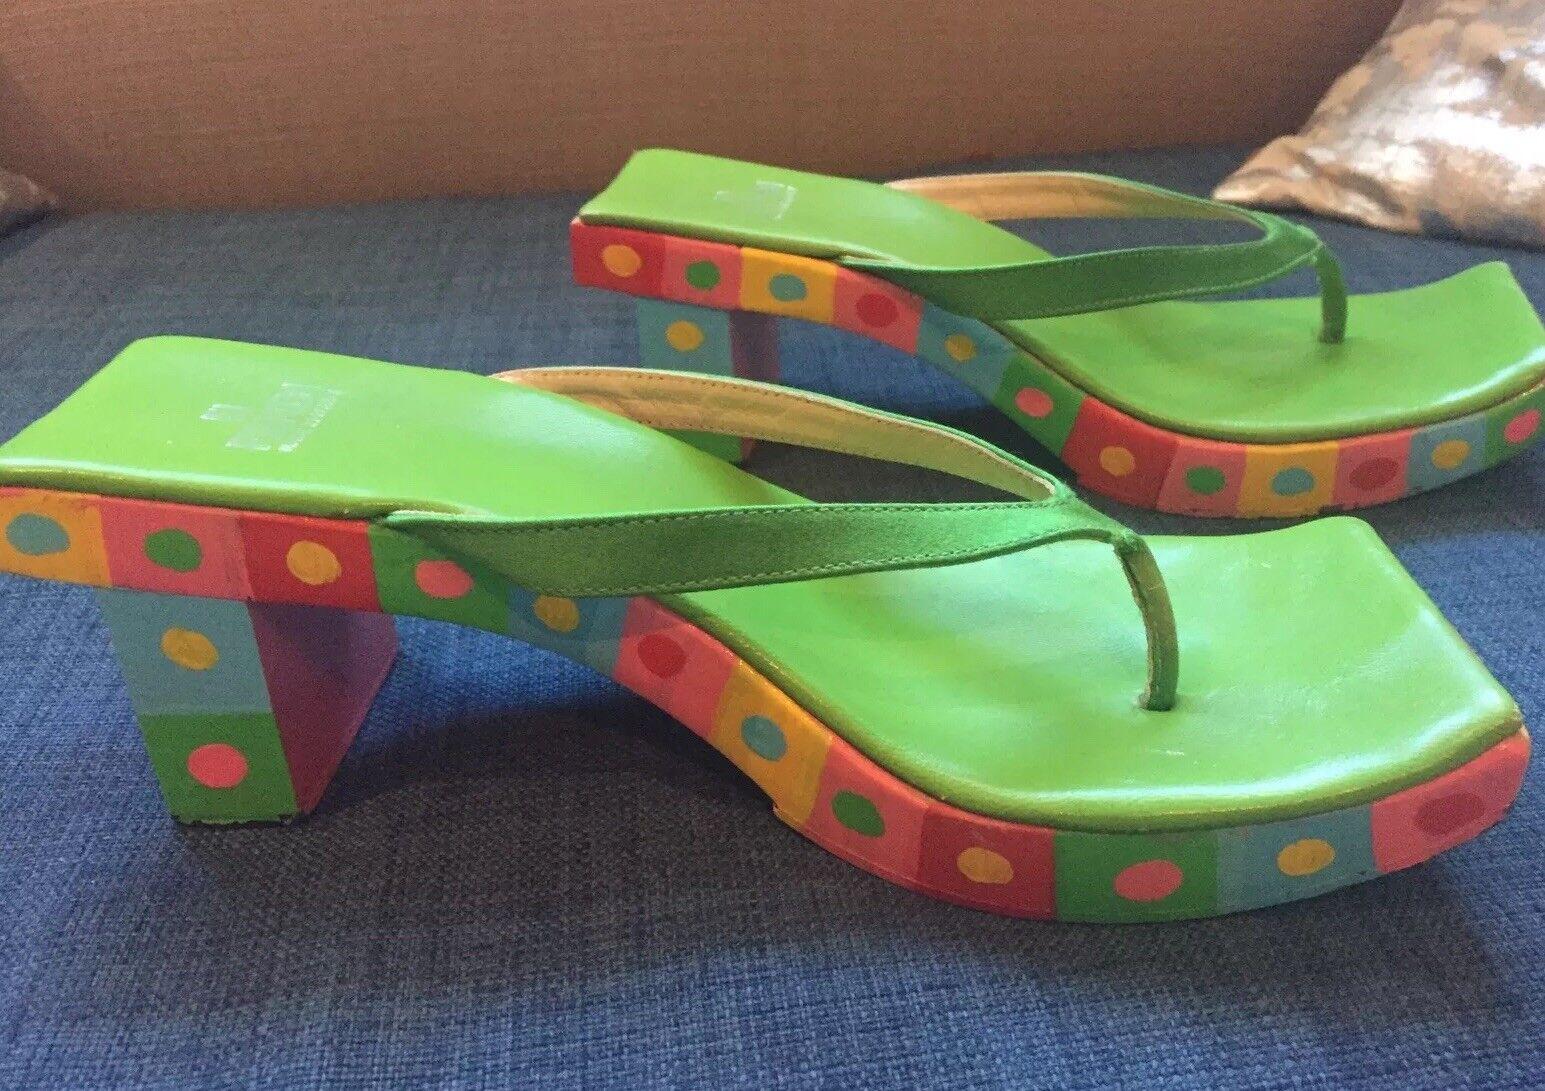 vendita di offerte Fendi vintage 1990s wood wood wood heel sandal rare   a prezzi accessibili